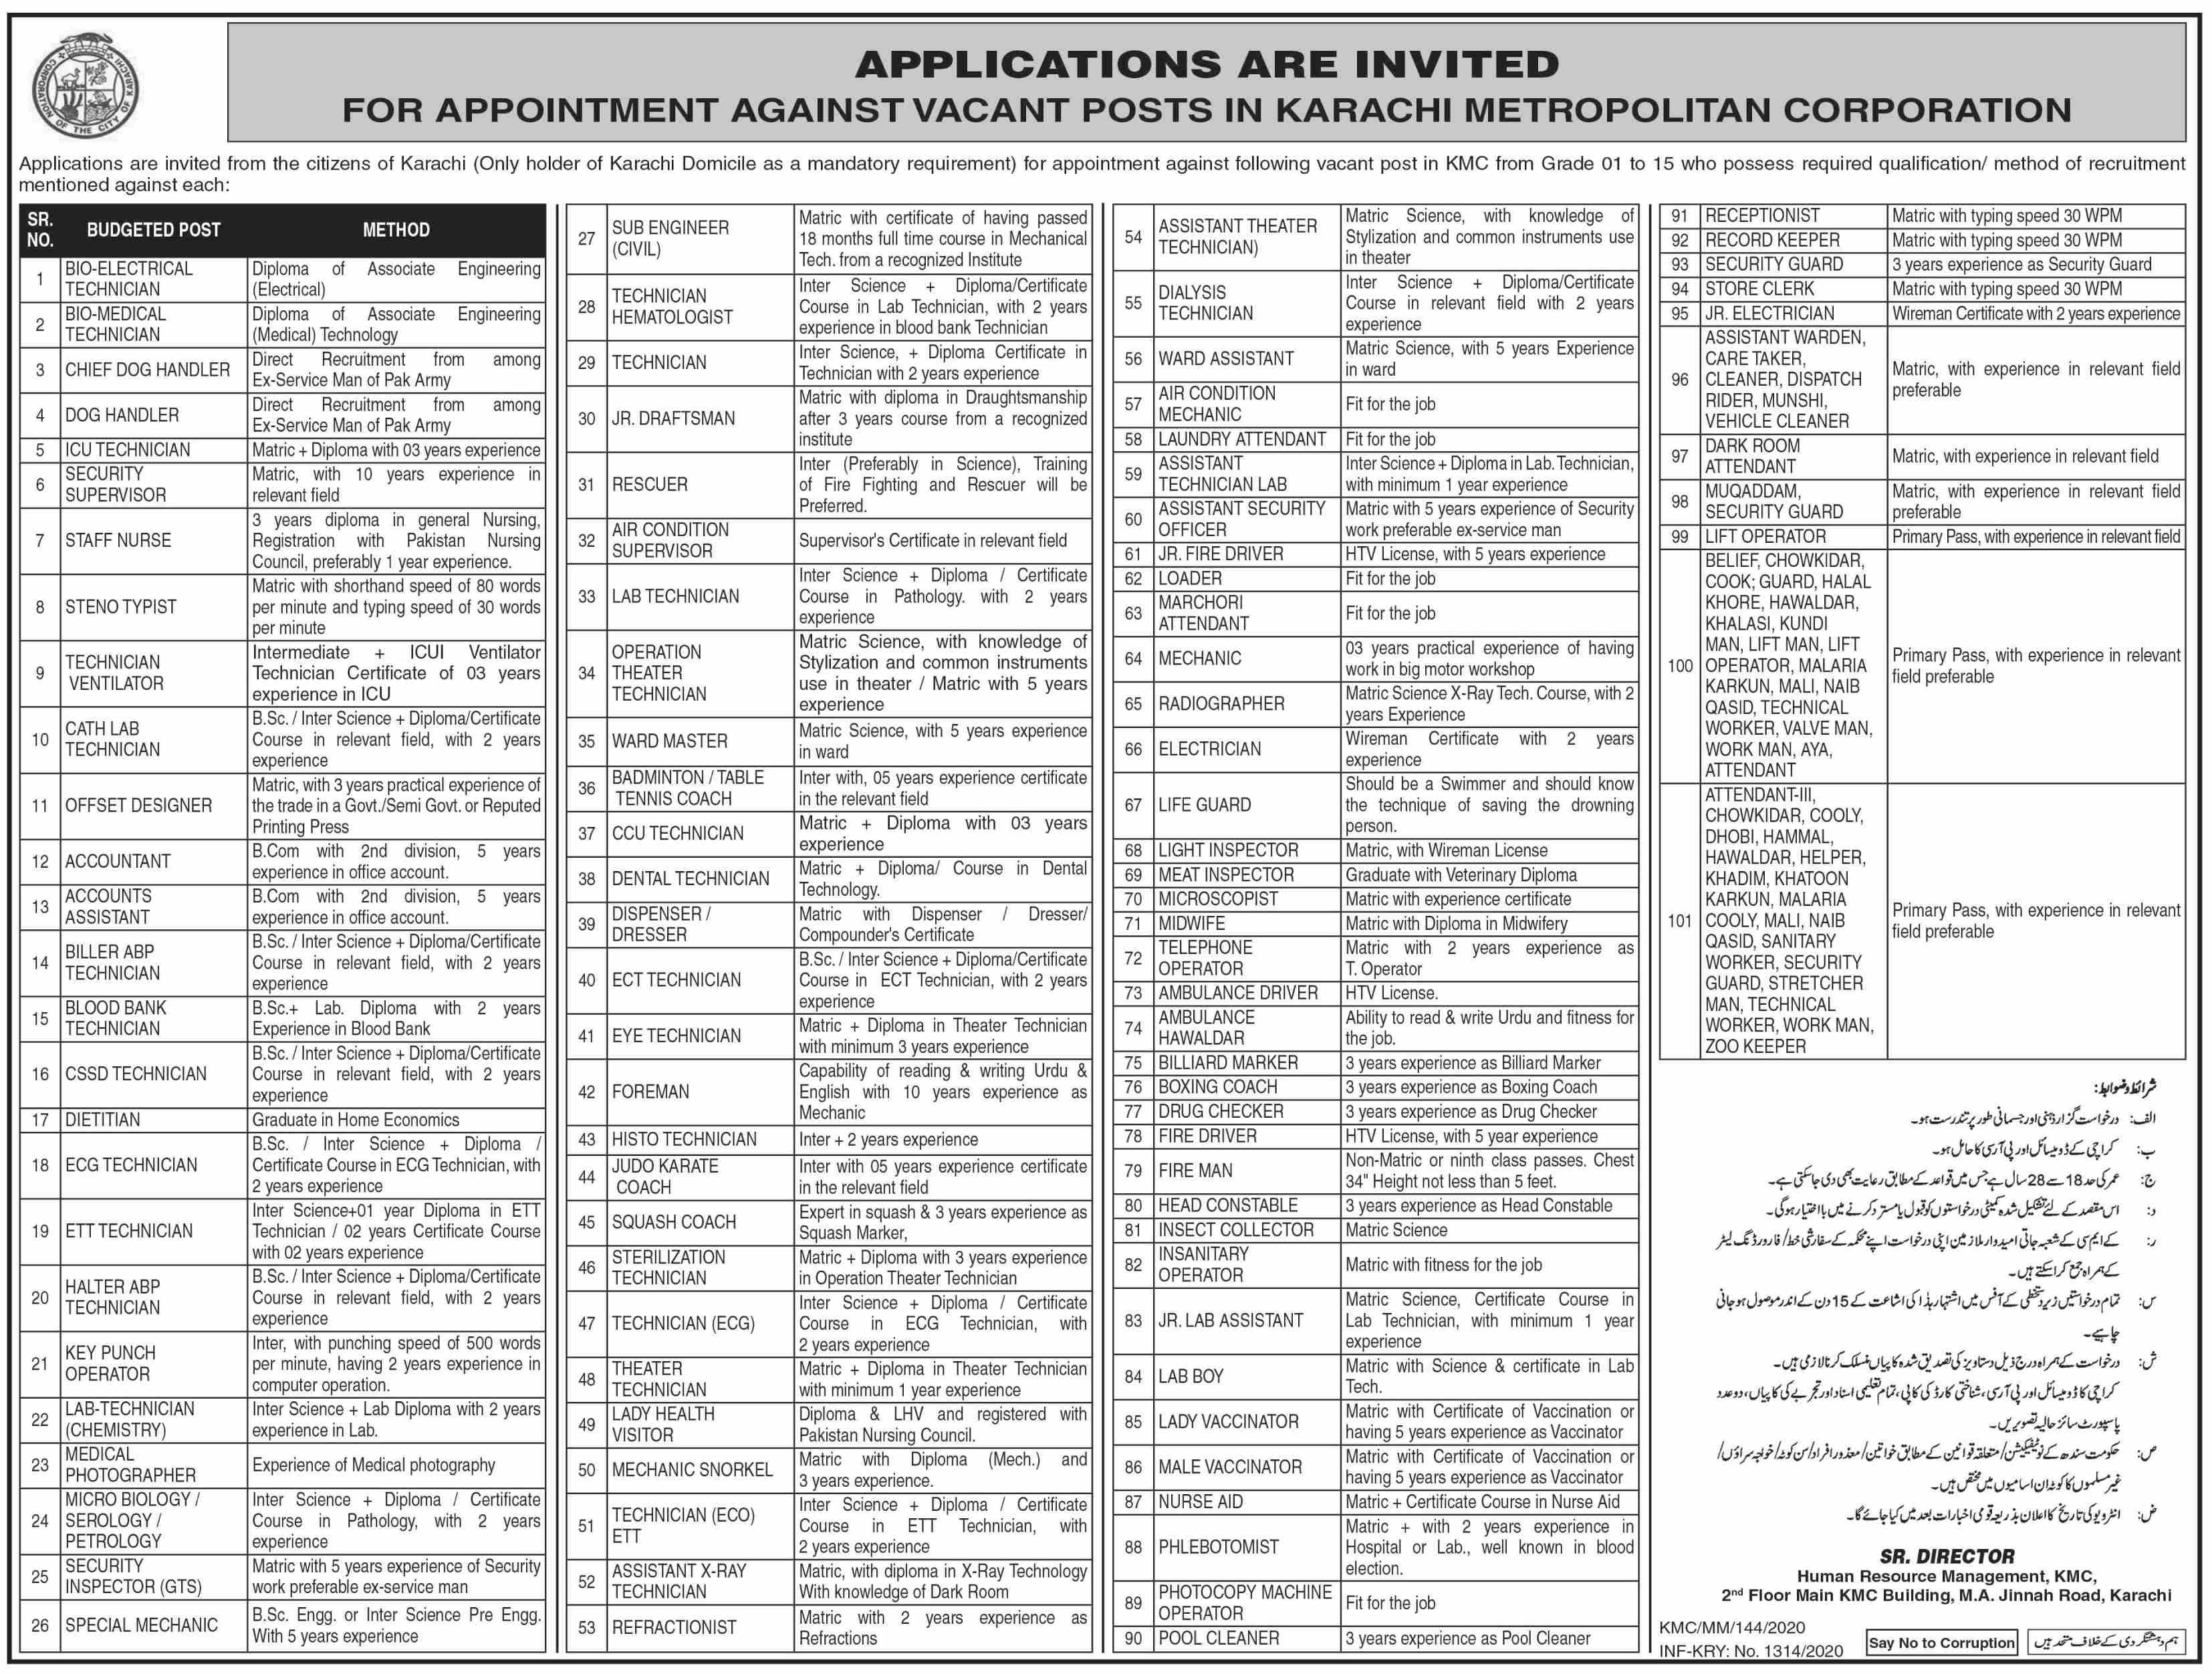 Metropolitan Corporation jobs newspaper ad for Supporting Staff in Karachi